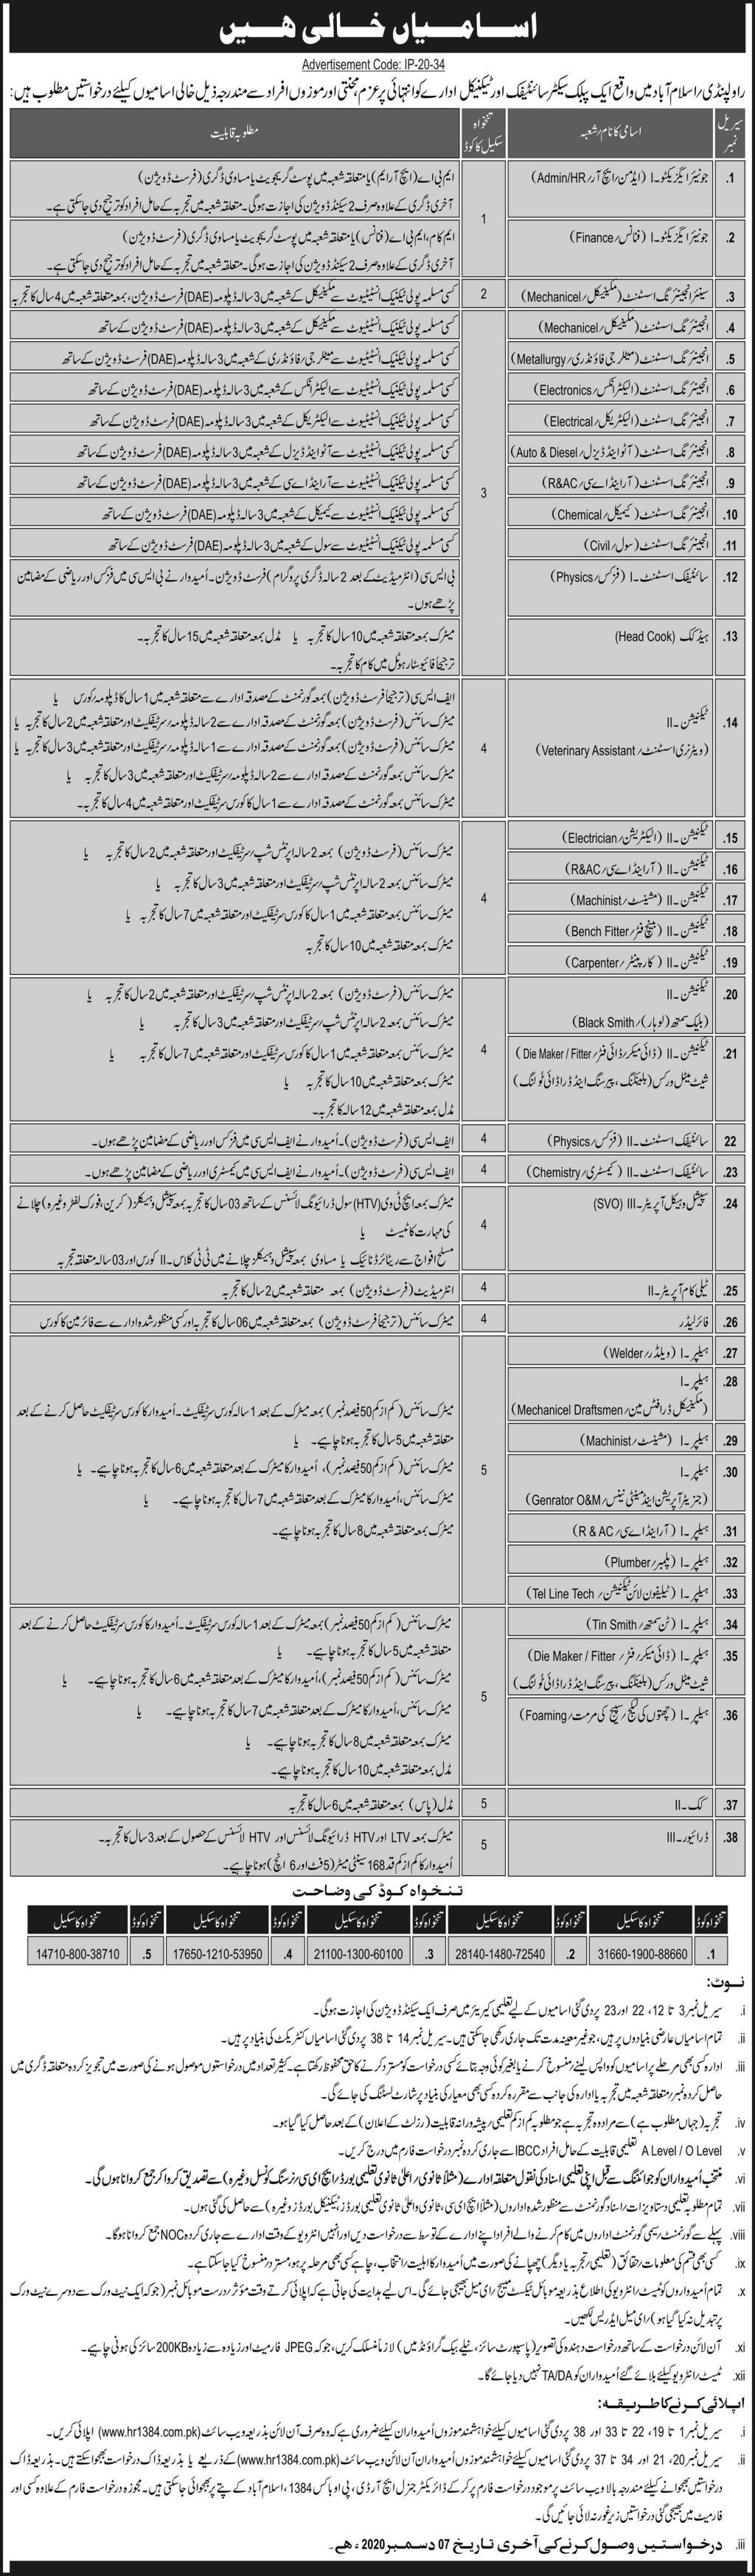 Public Sector Scientific & Technical Organization jobs newspaper ad for Draftsman in Rawalpindi